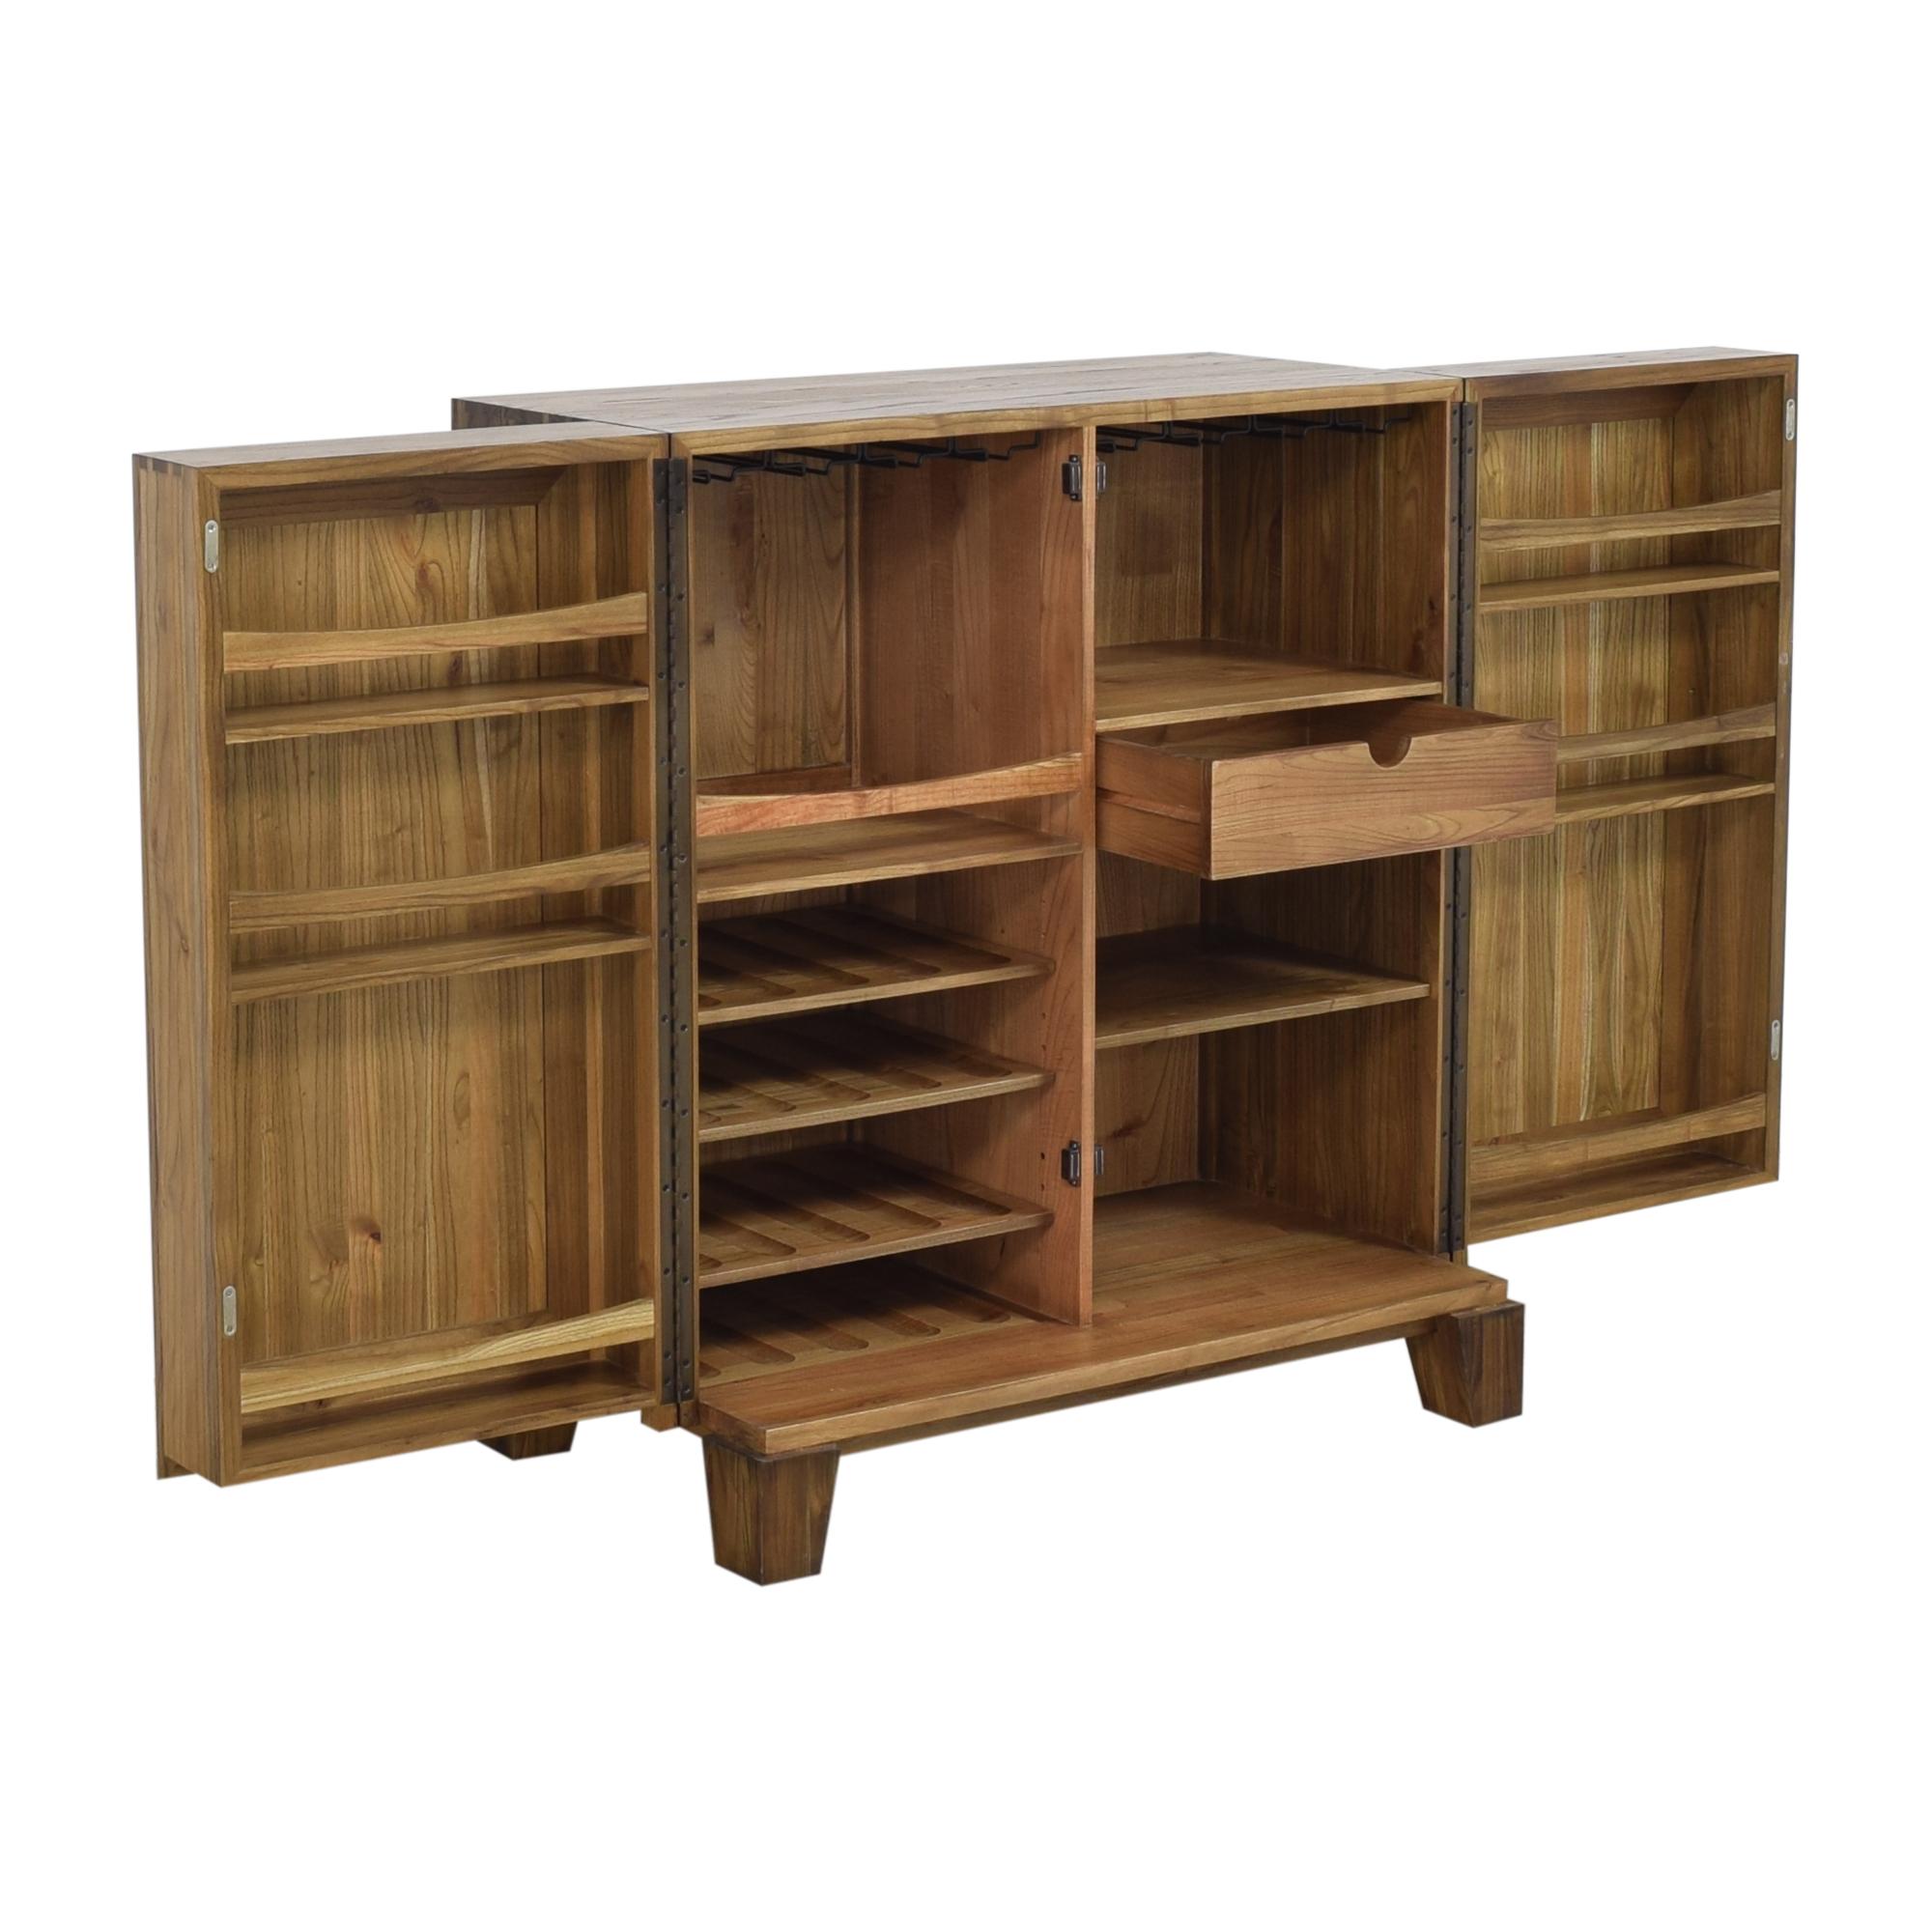 Crate & Barrel Crate & Barrel Marin Bar Cabinet on sale